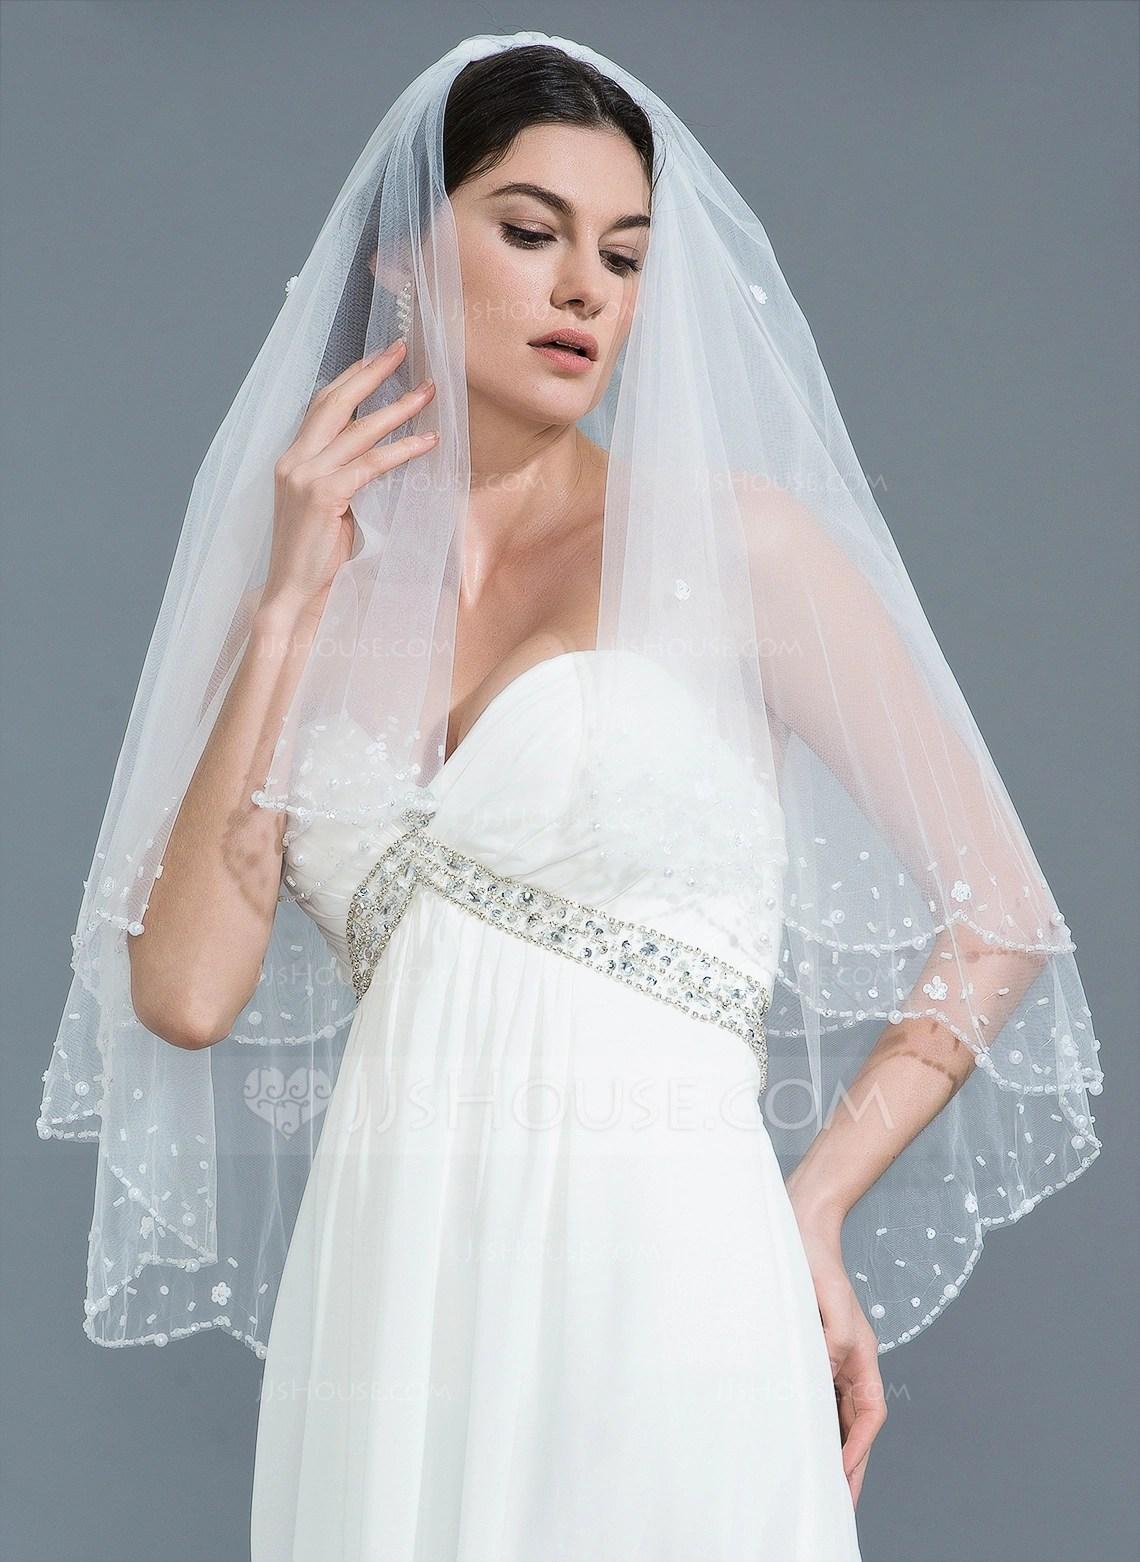 Twotier Beaded Edge Fingertip Bridal Veils With Beading 006109871  Wedding Veils  JJsHouse